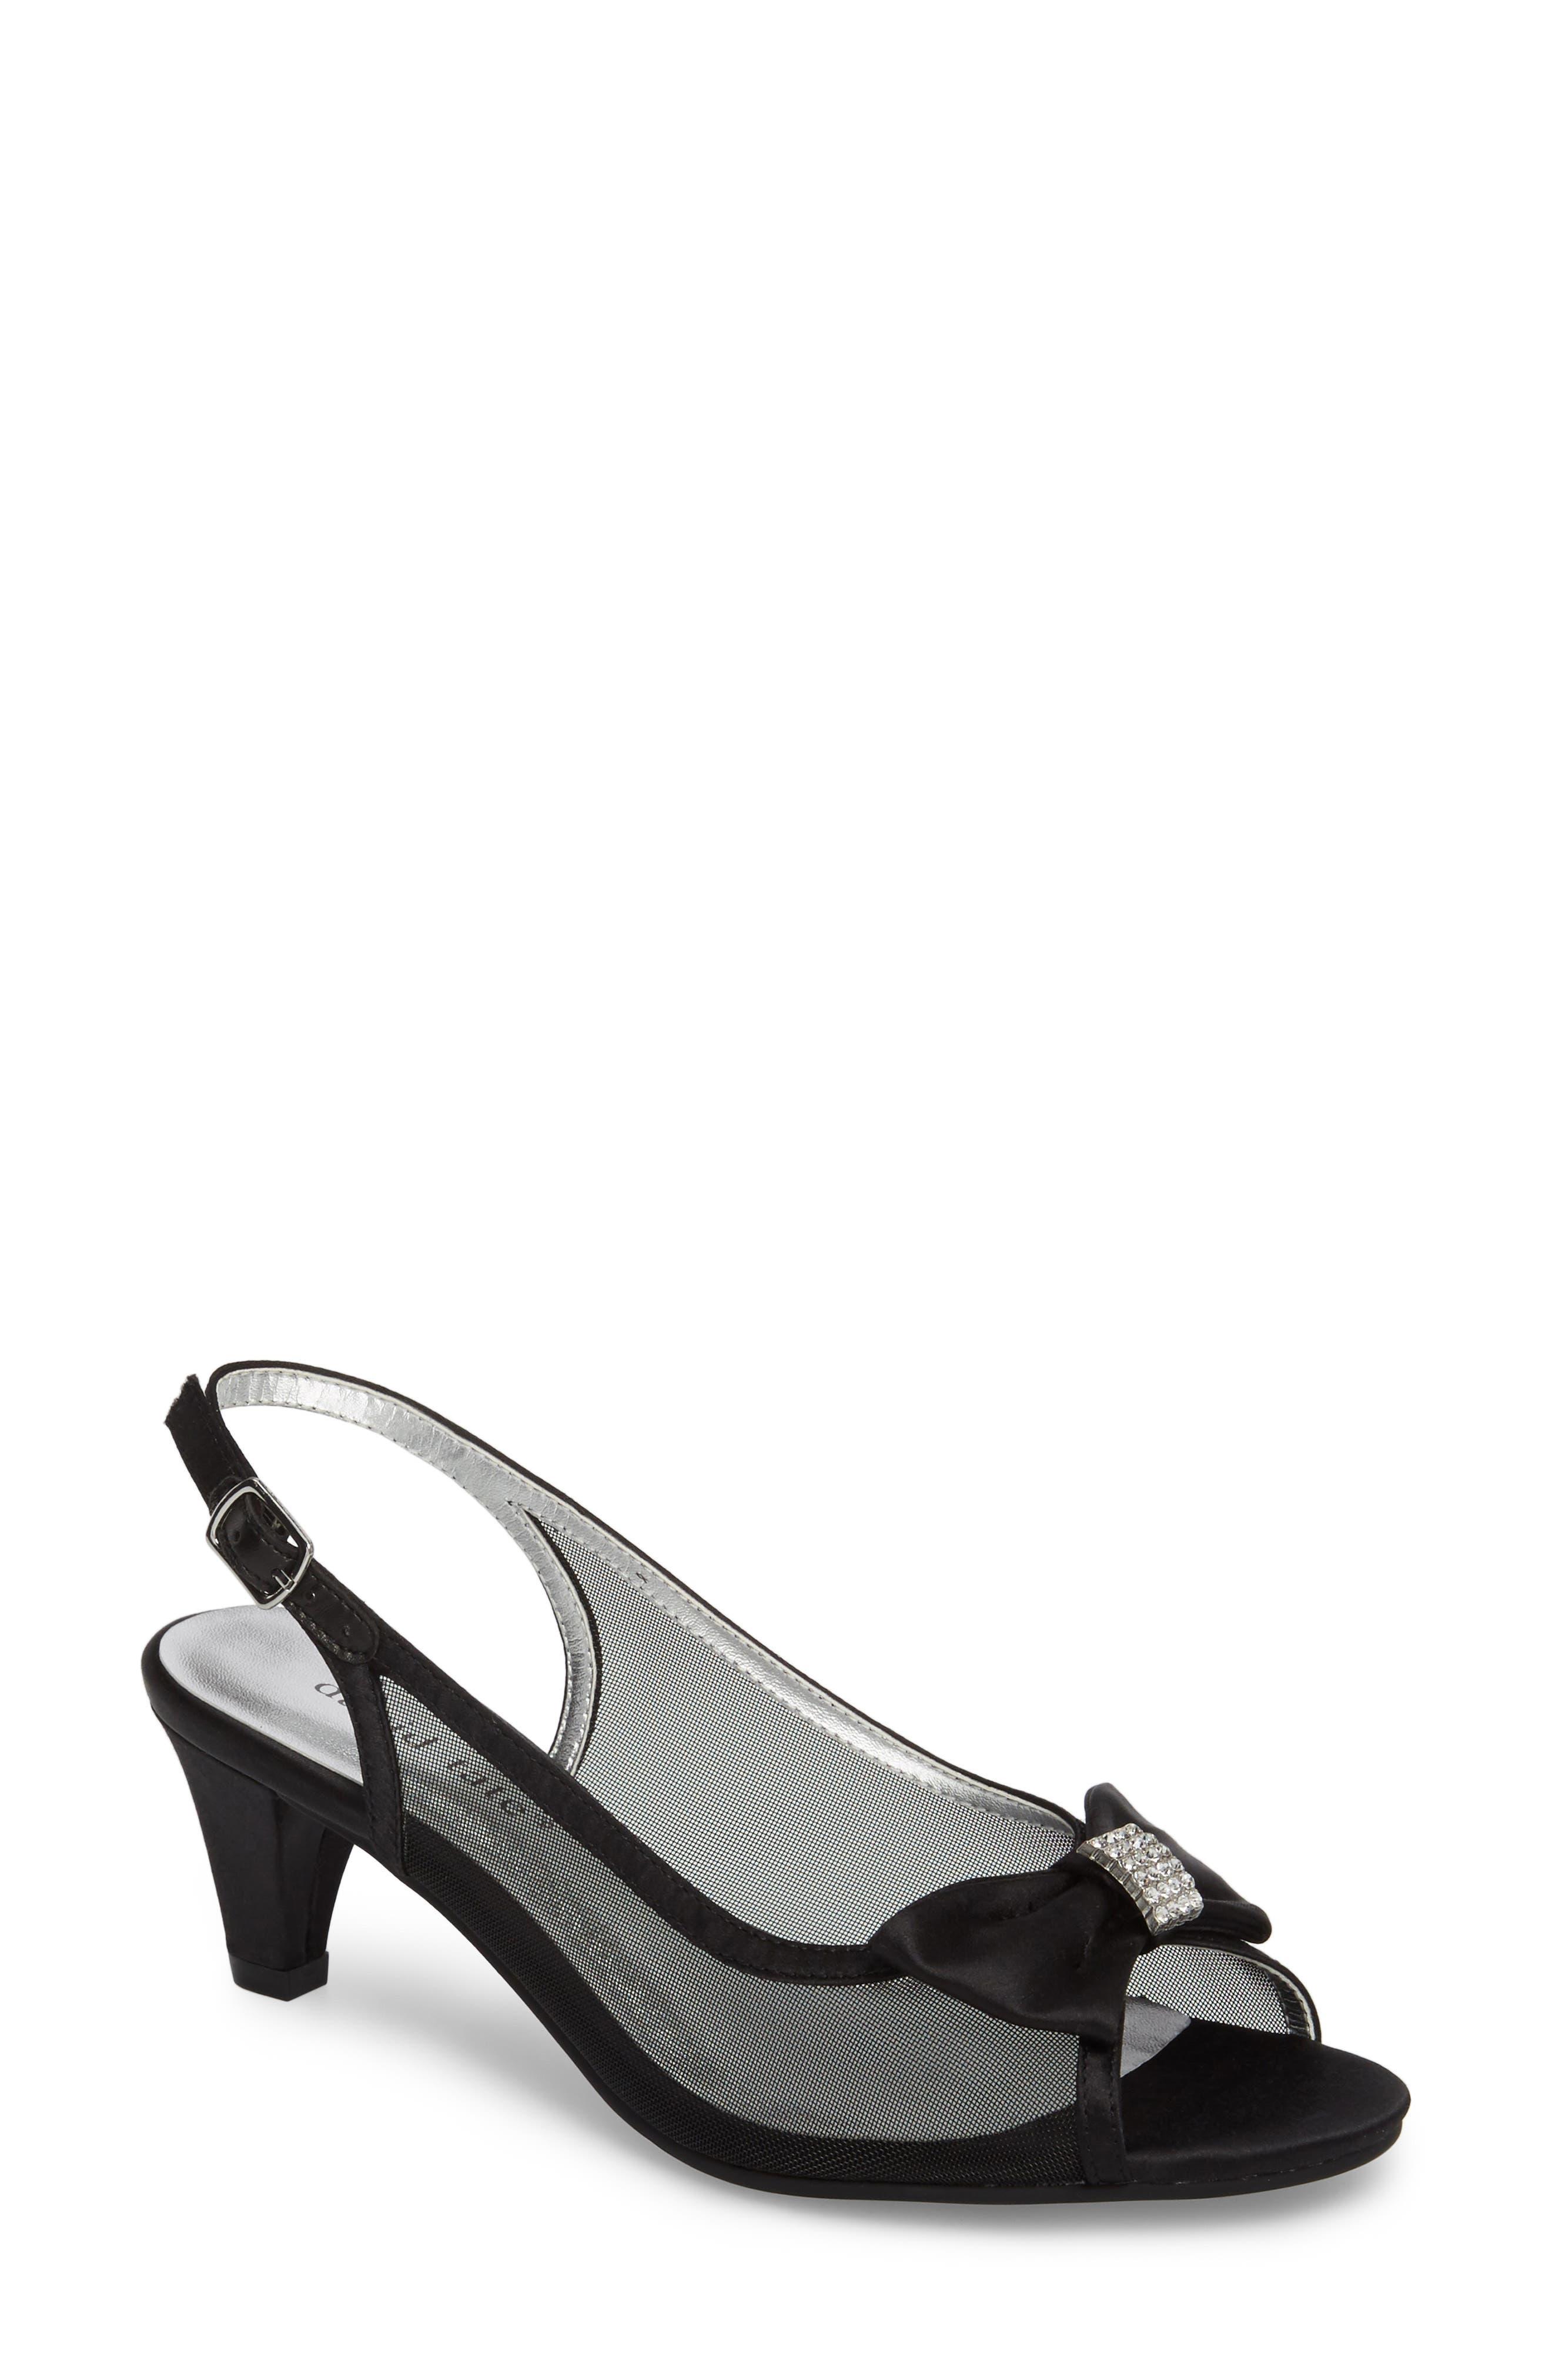 DAVID TATE Foxy Slingback Sandal, Main, color, BLACK SATIN